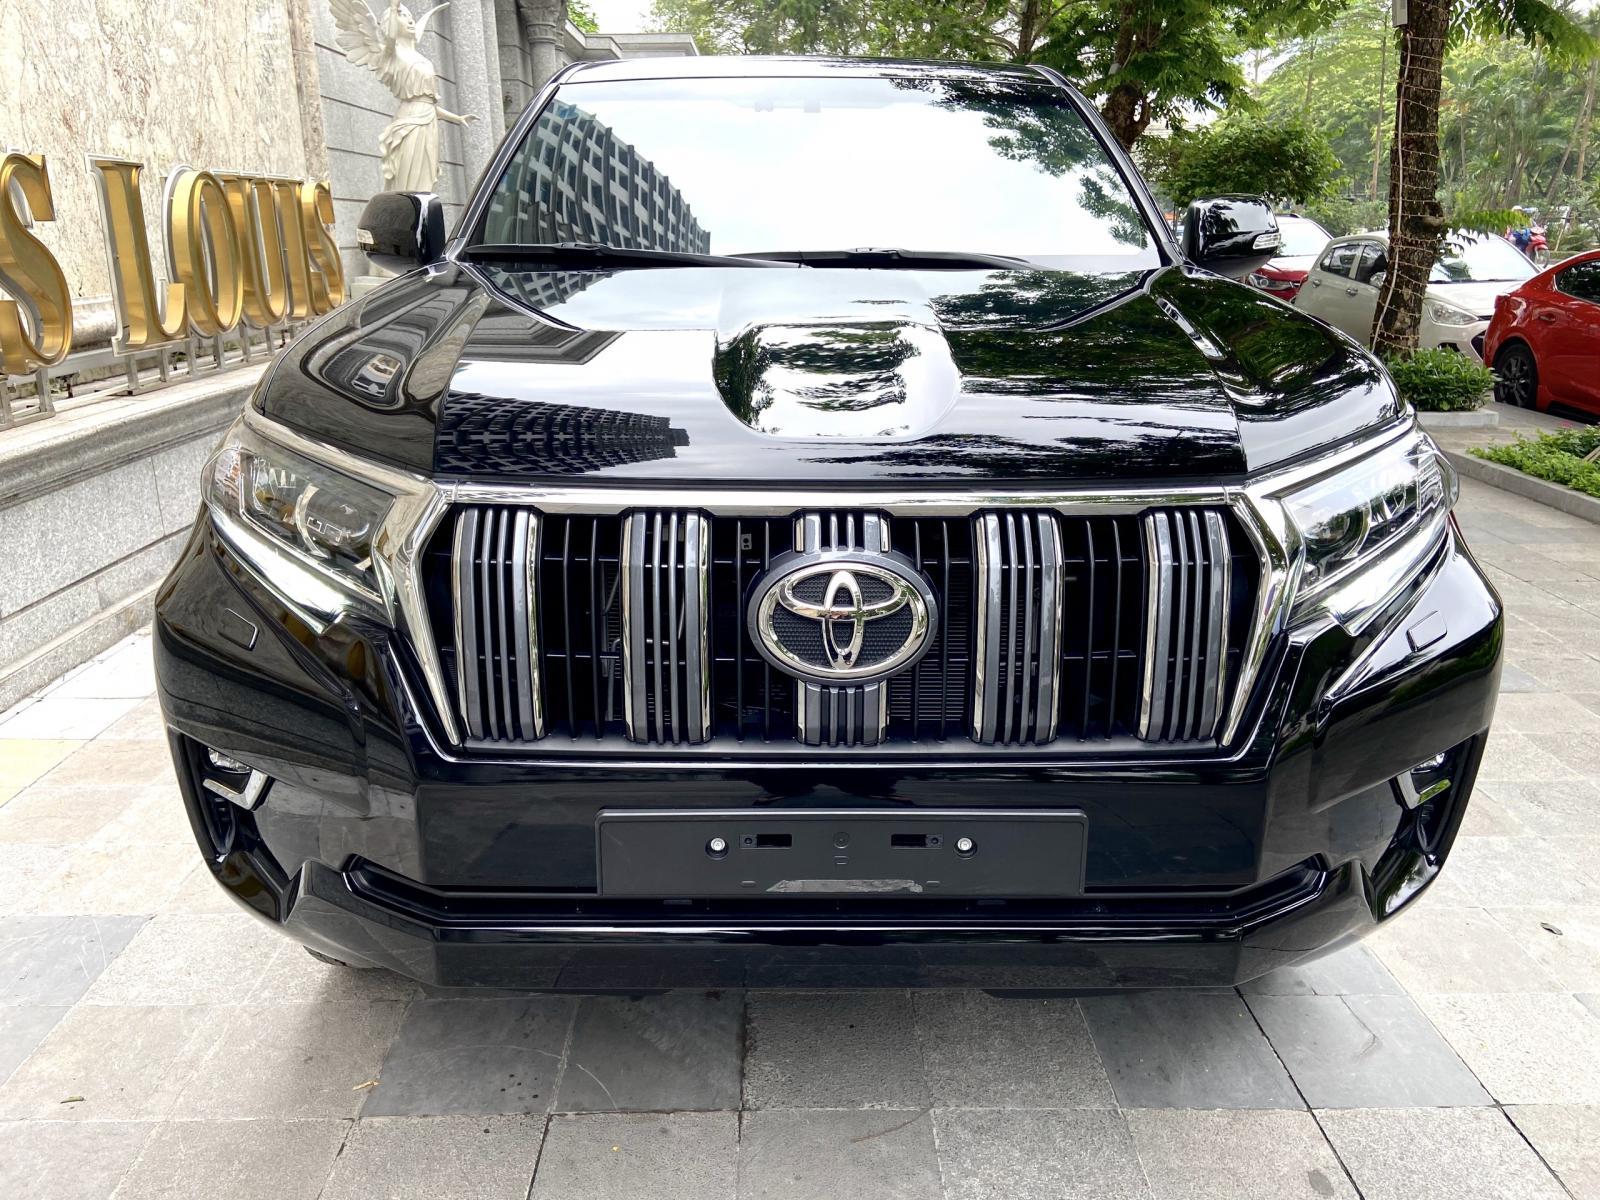 Bán Land Cuiser Prado VX model 2021 mới nhất Việt Nam